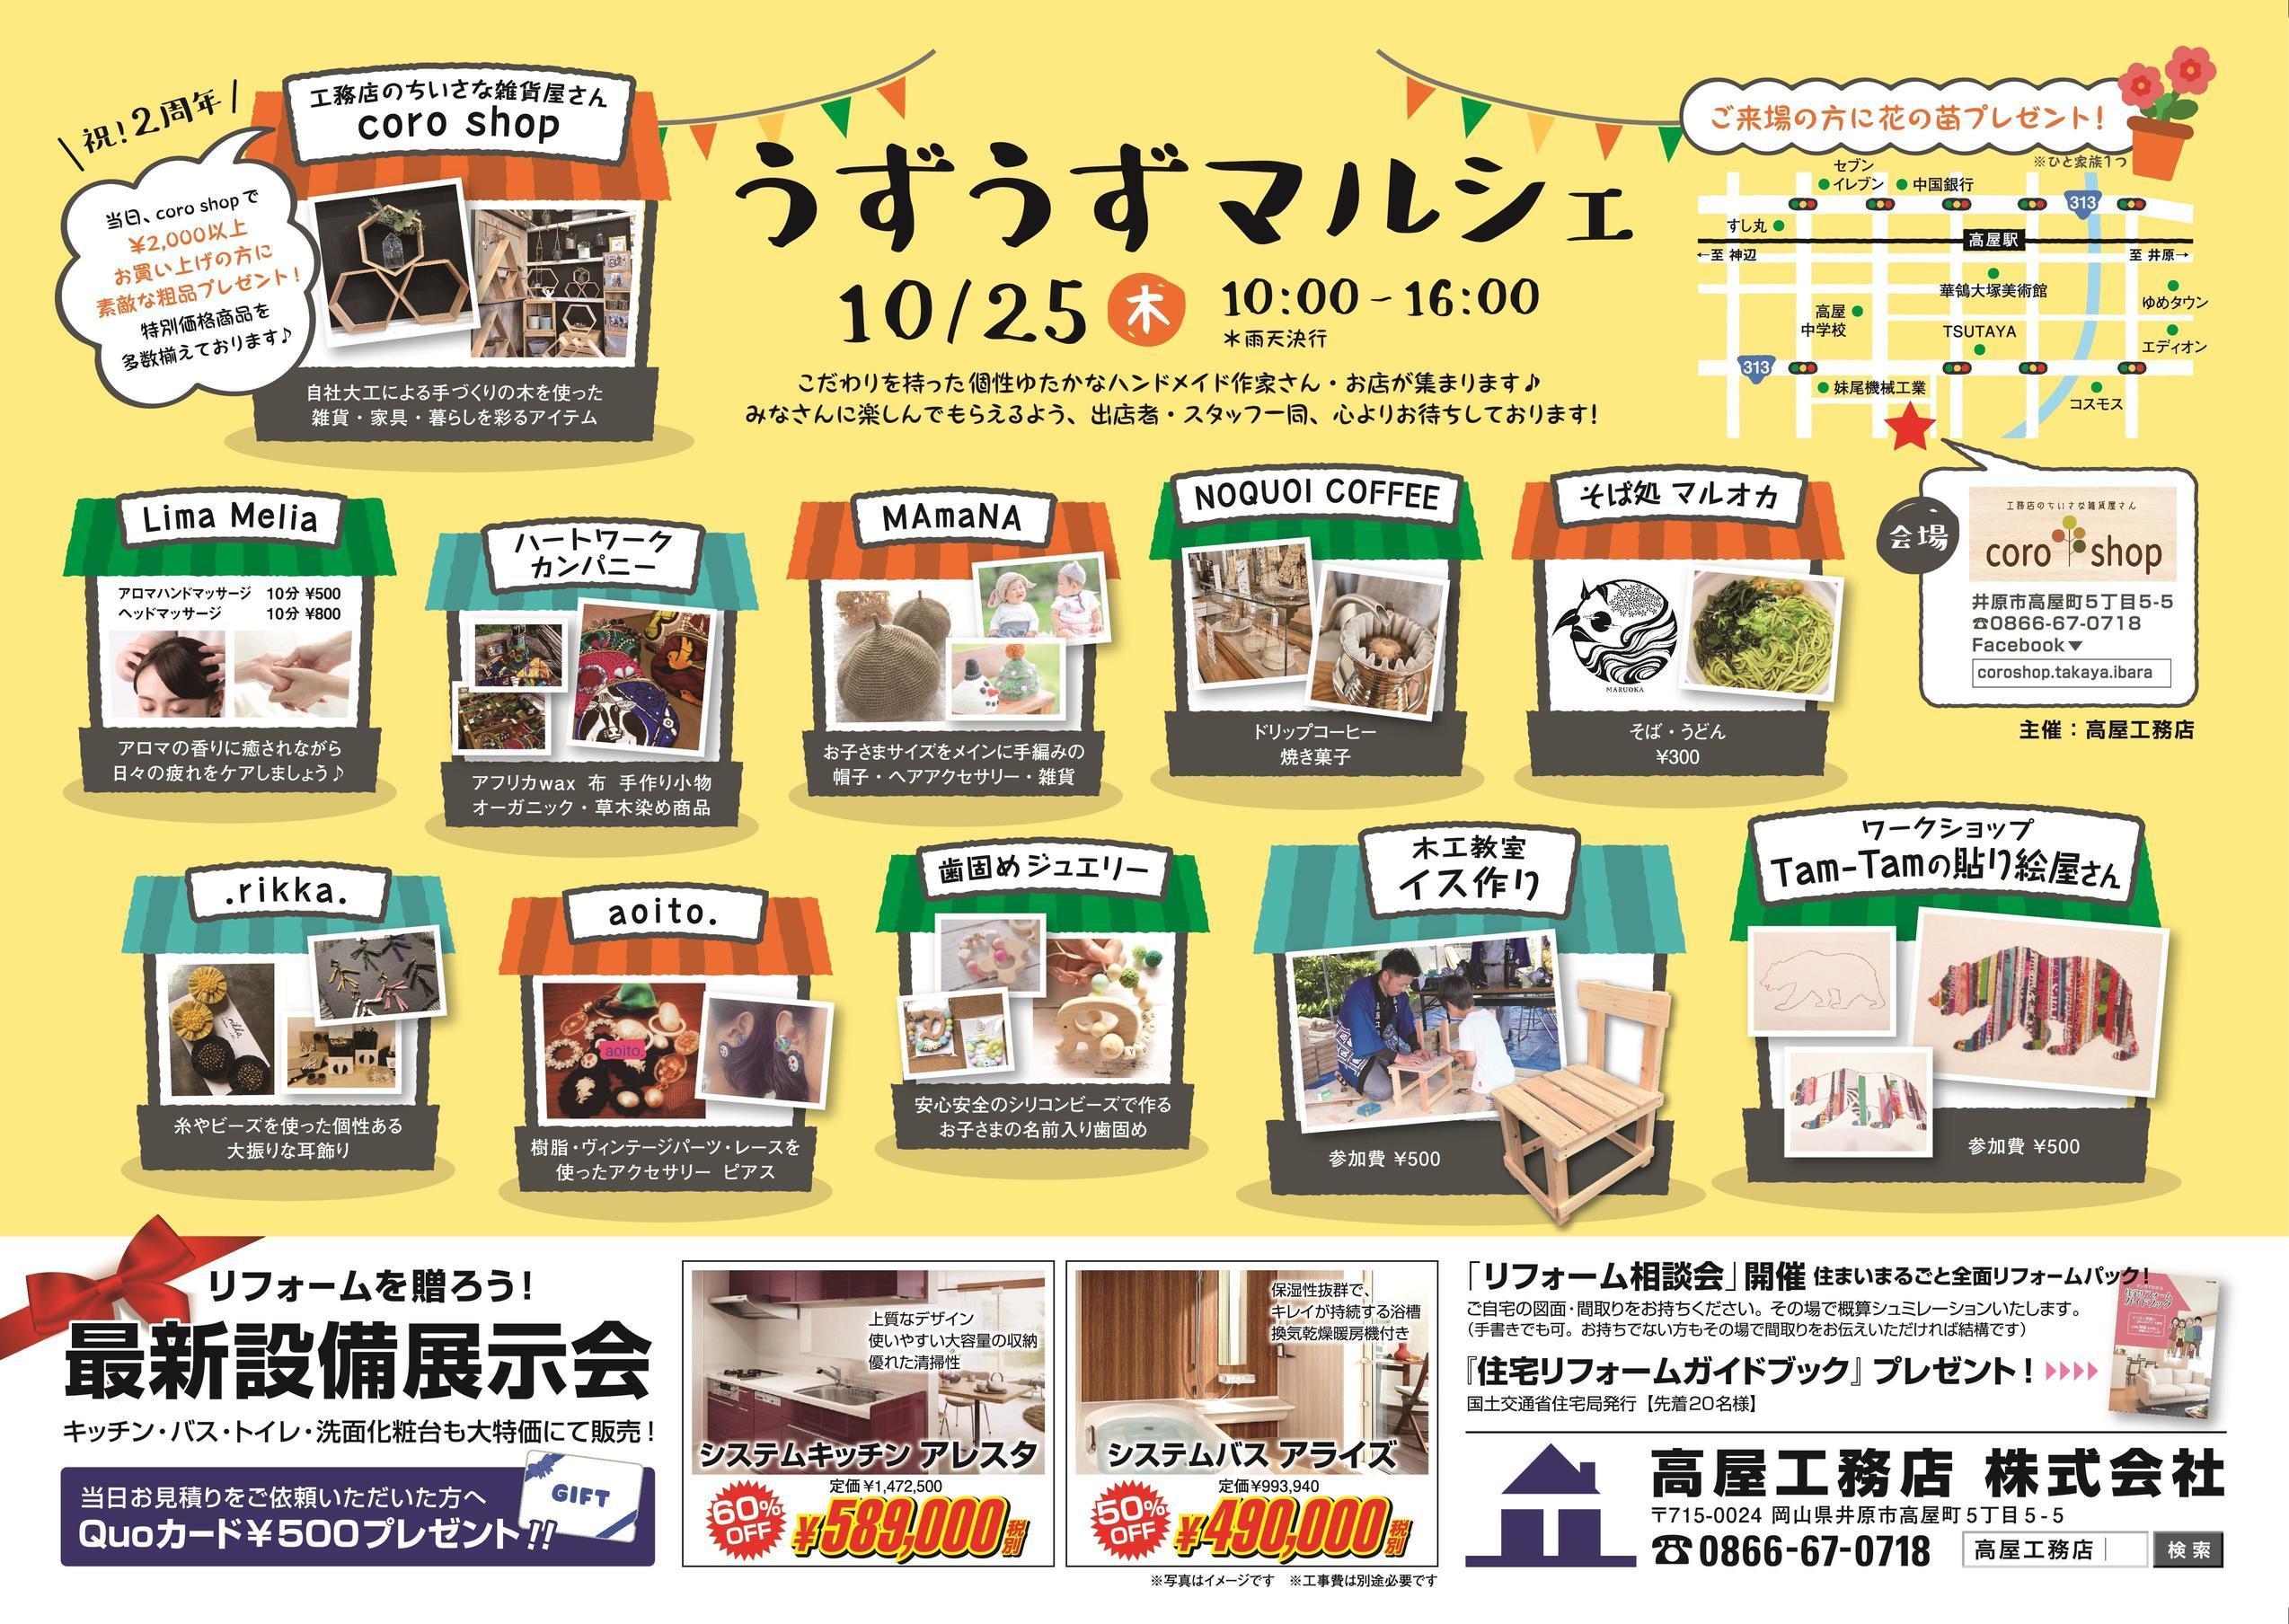 uzuuzu_0920ol修正 枠カット.jpg